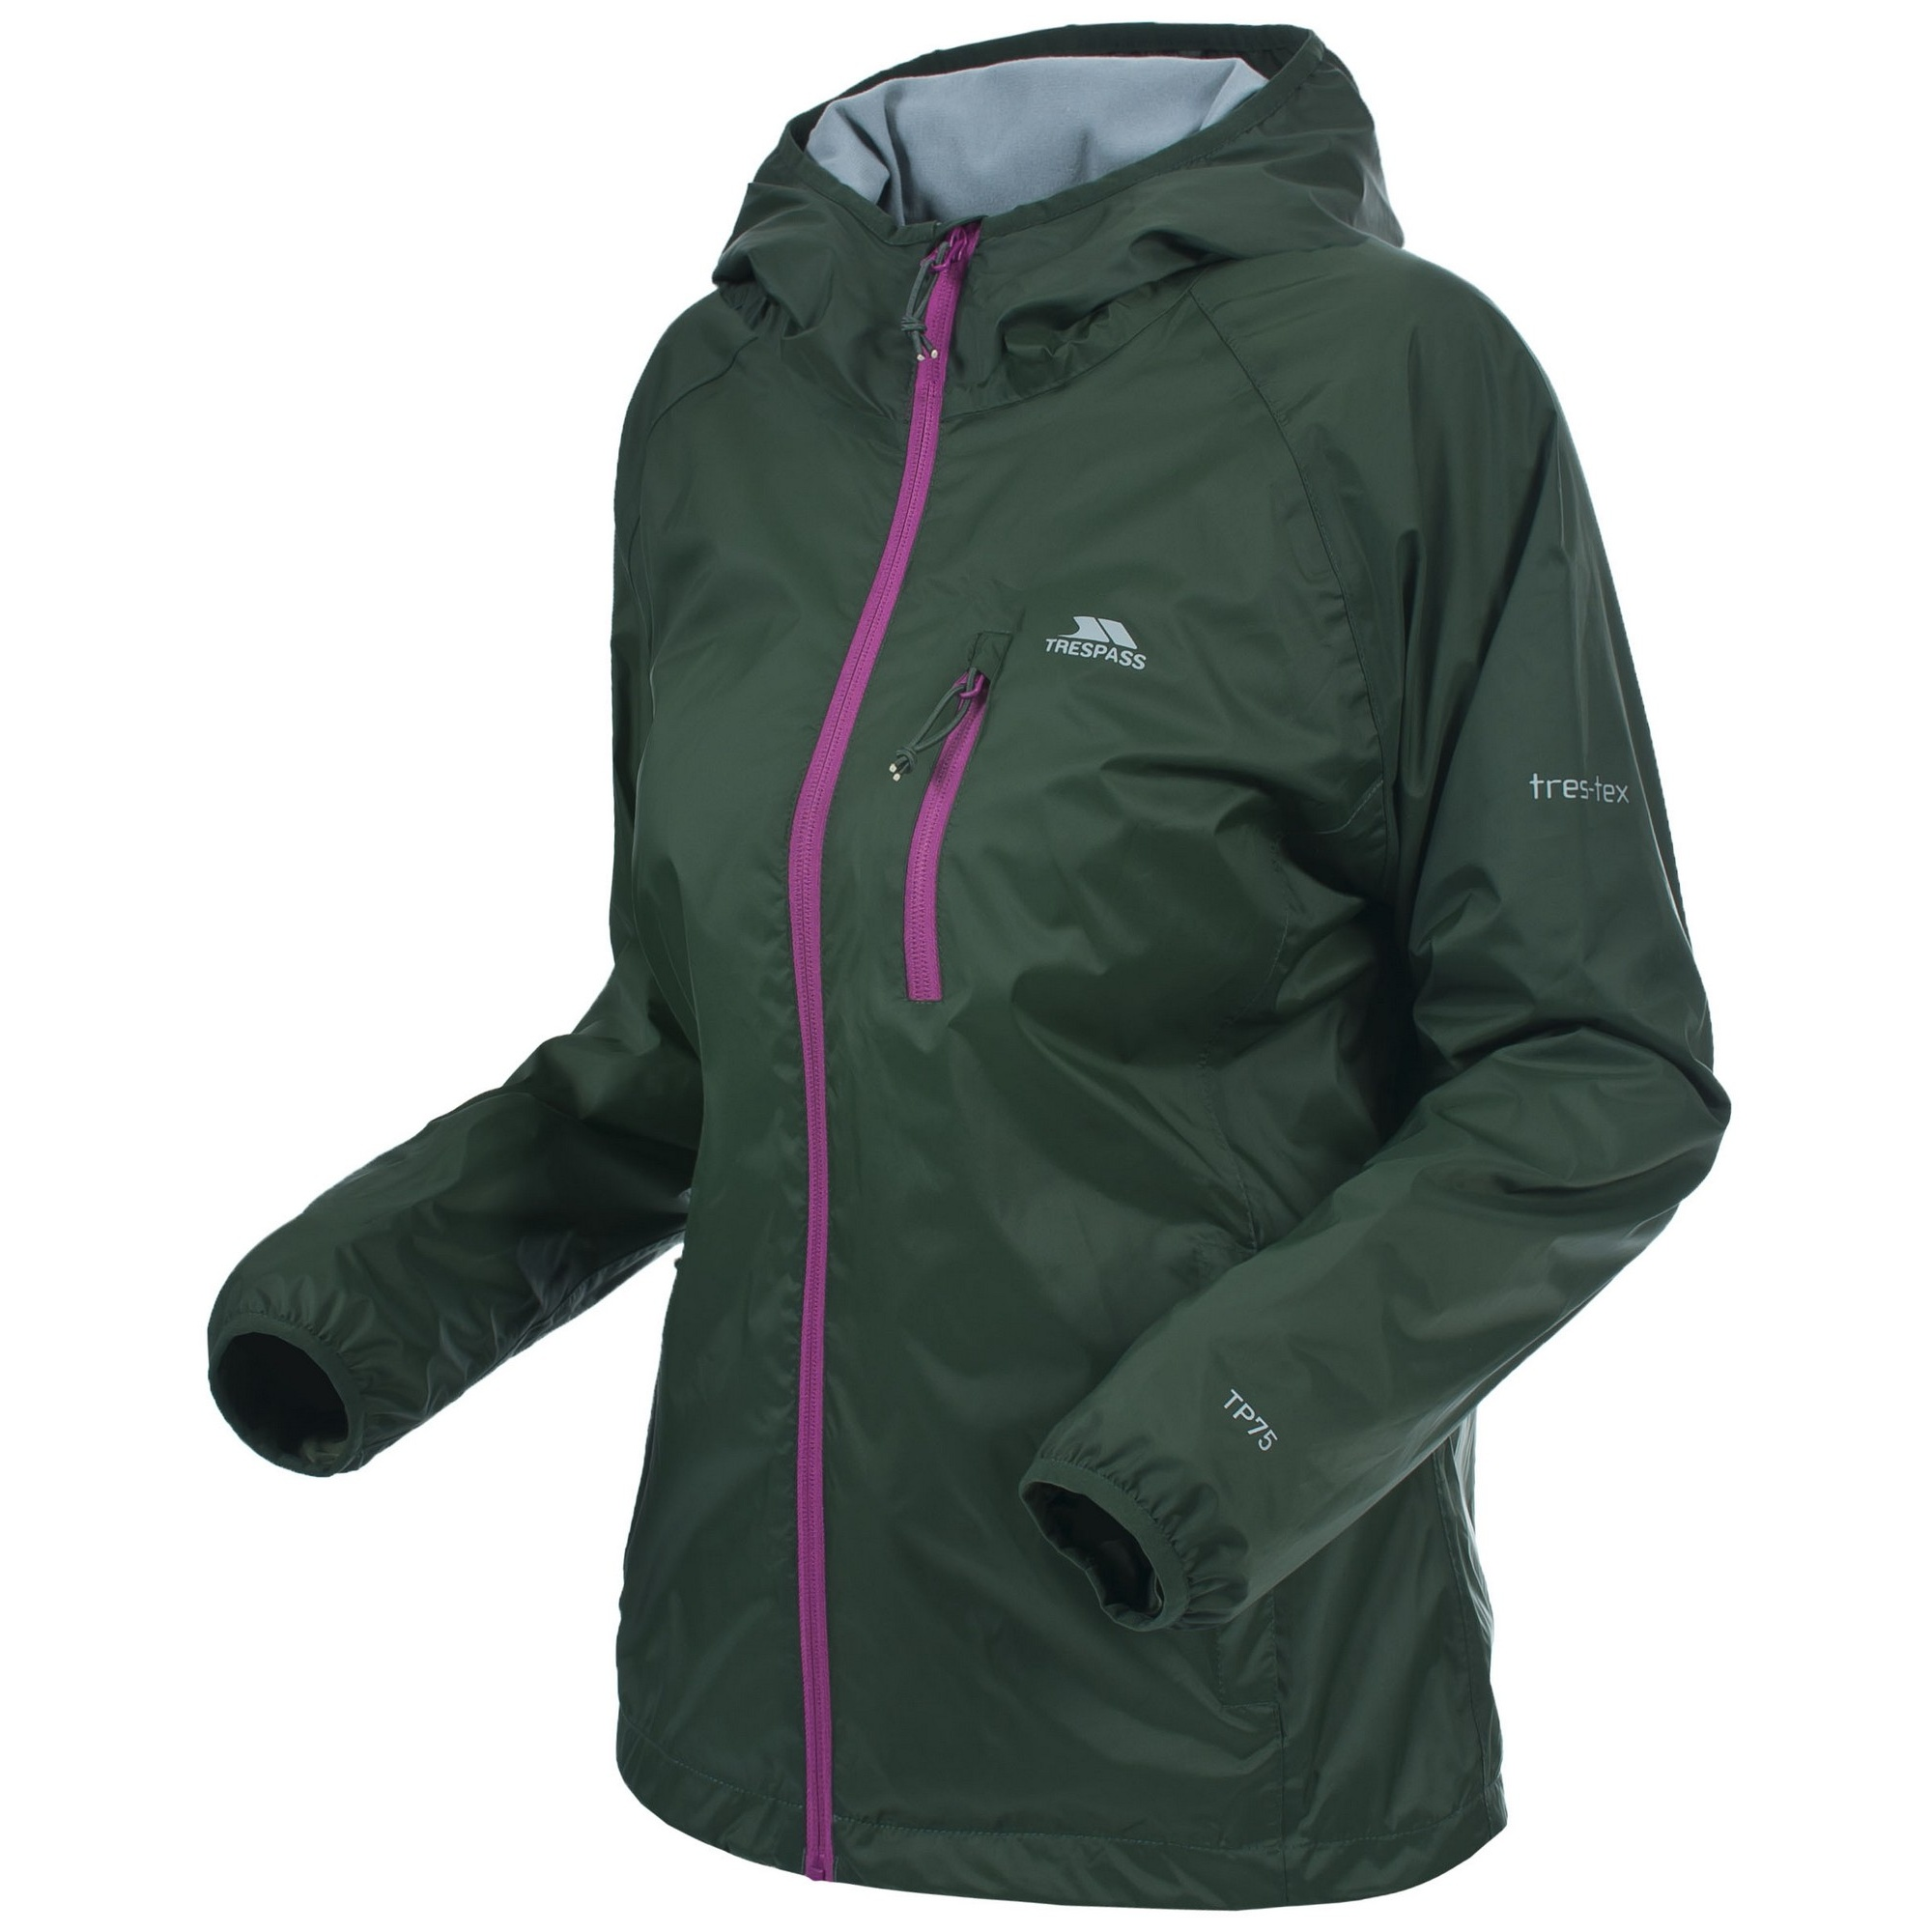 Trespass hemisphere womens outdoor jacket